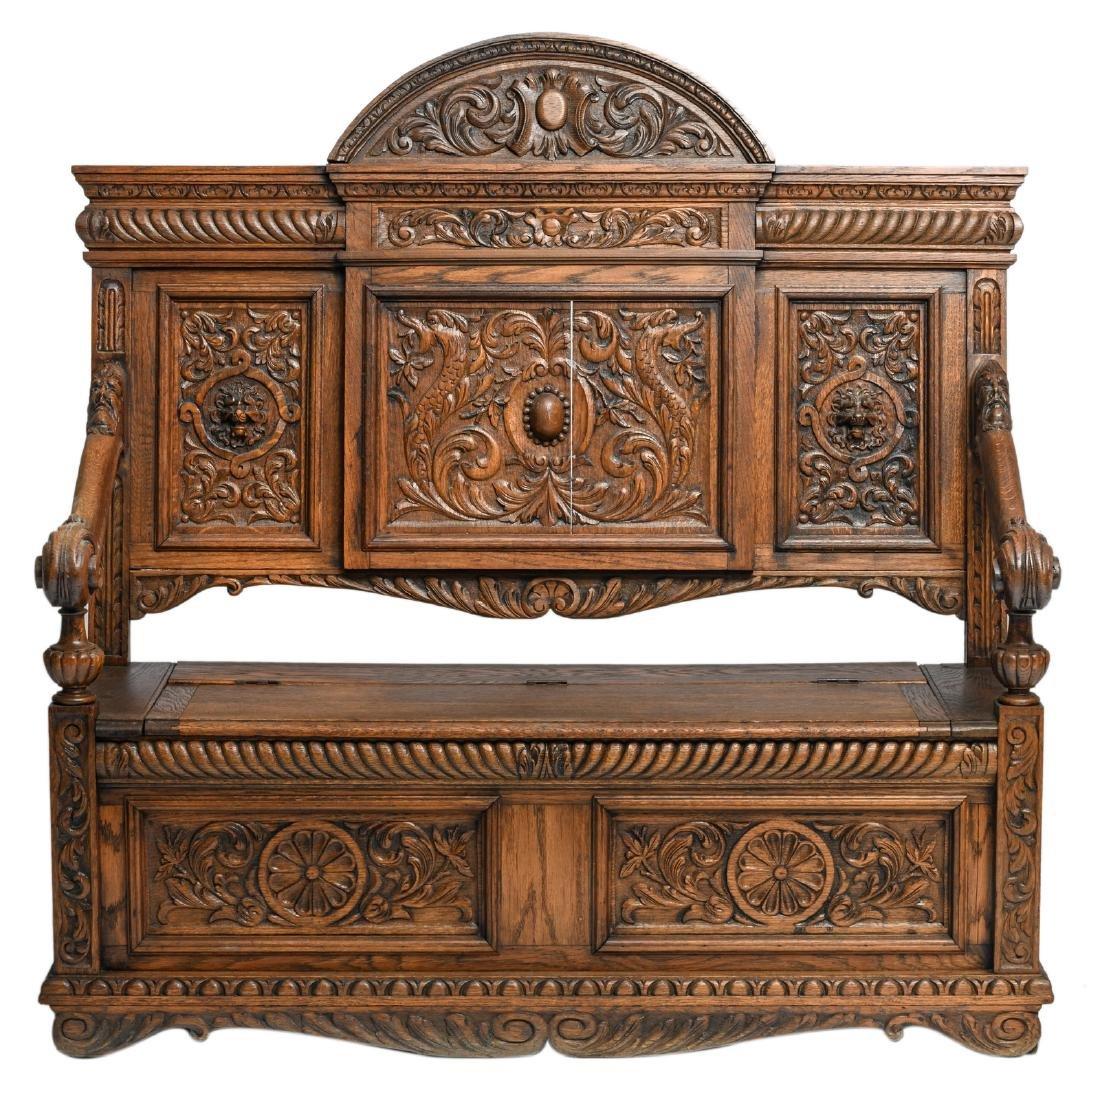 An oak Renaissance revival coffer bench seat,H 141,5